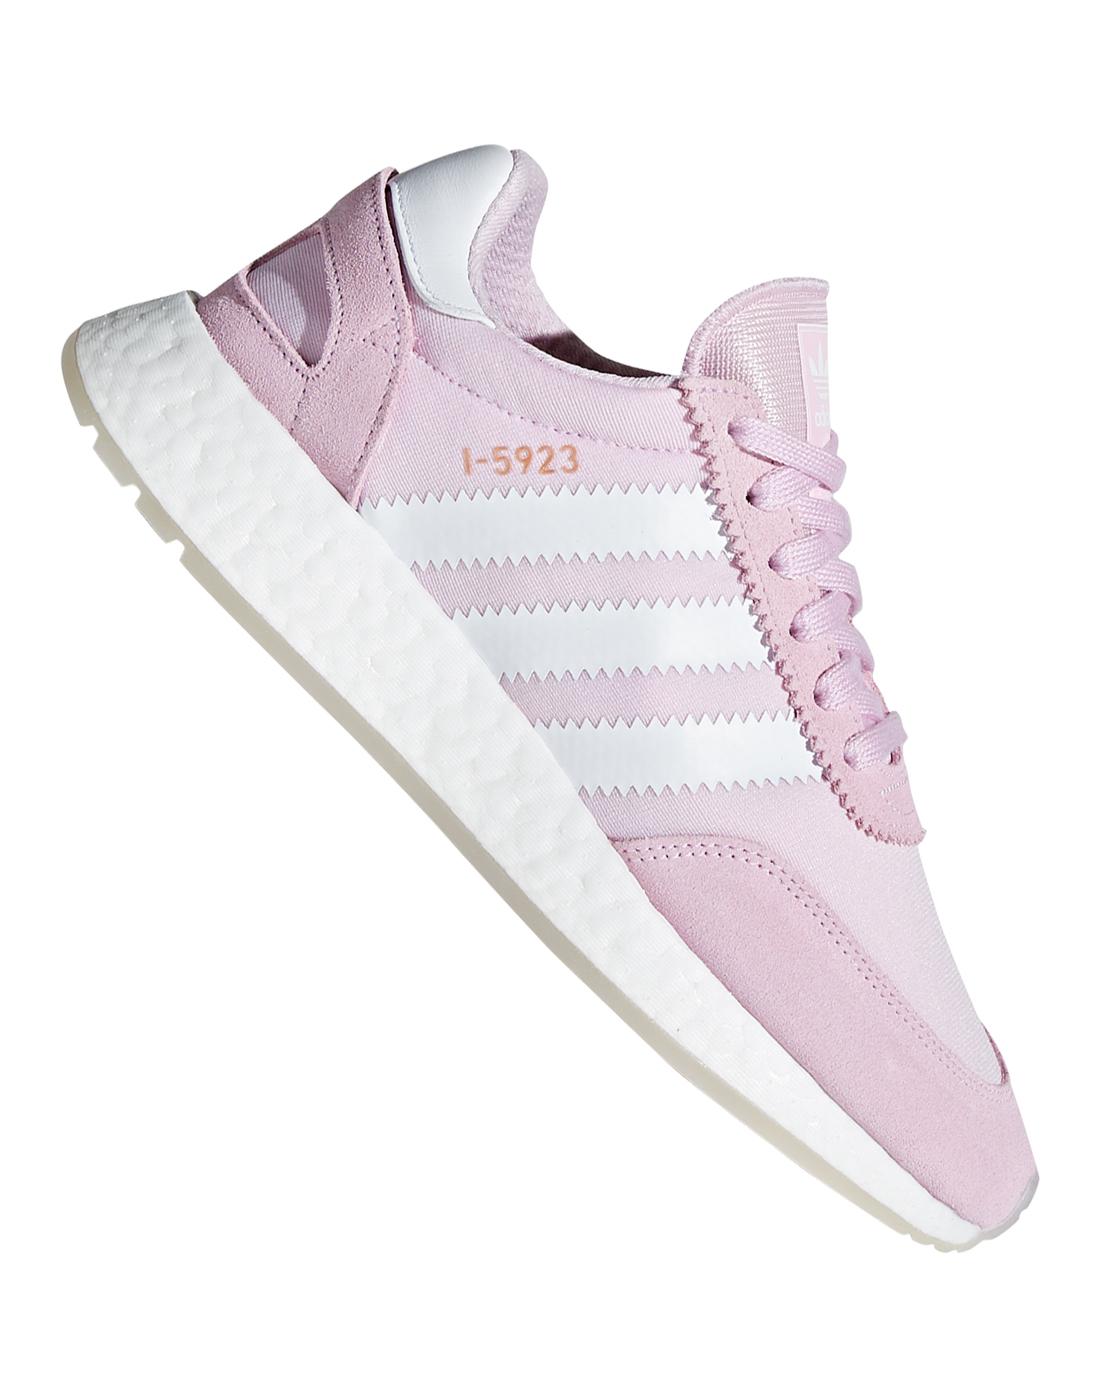 sports shoes 1bbb8 9b54e Womens I-5923 ...